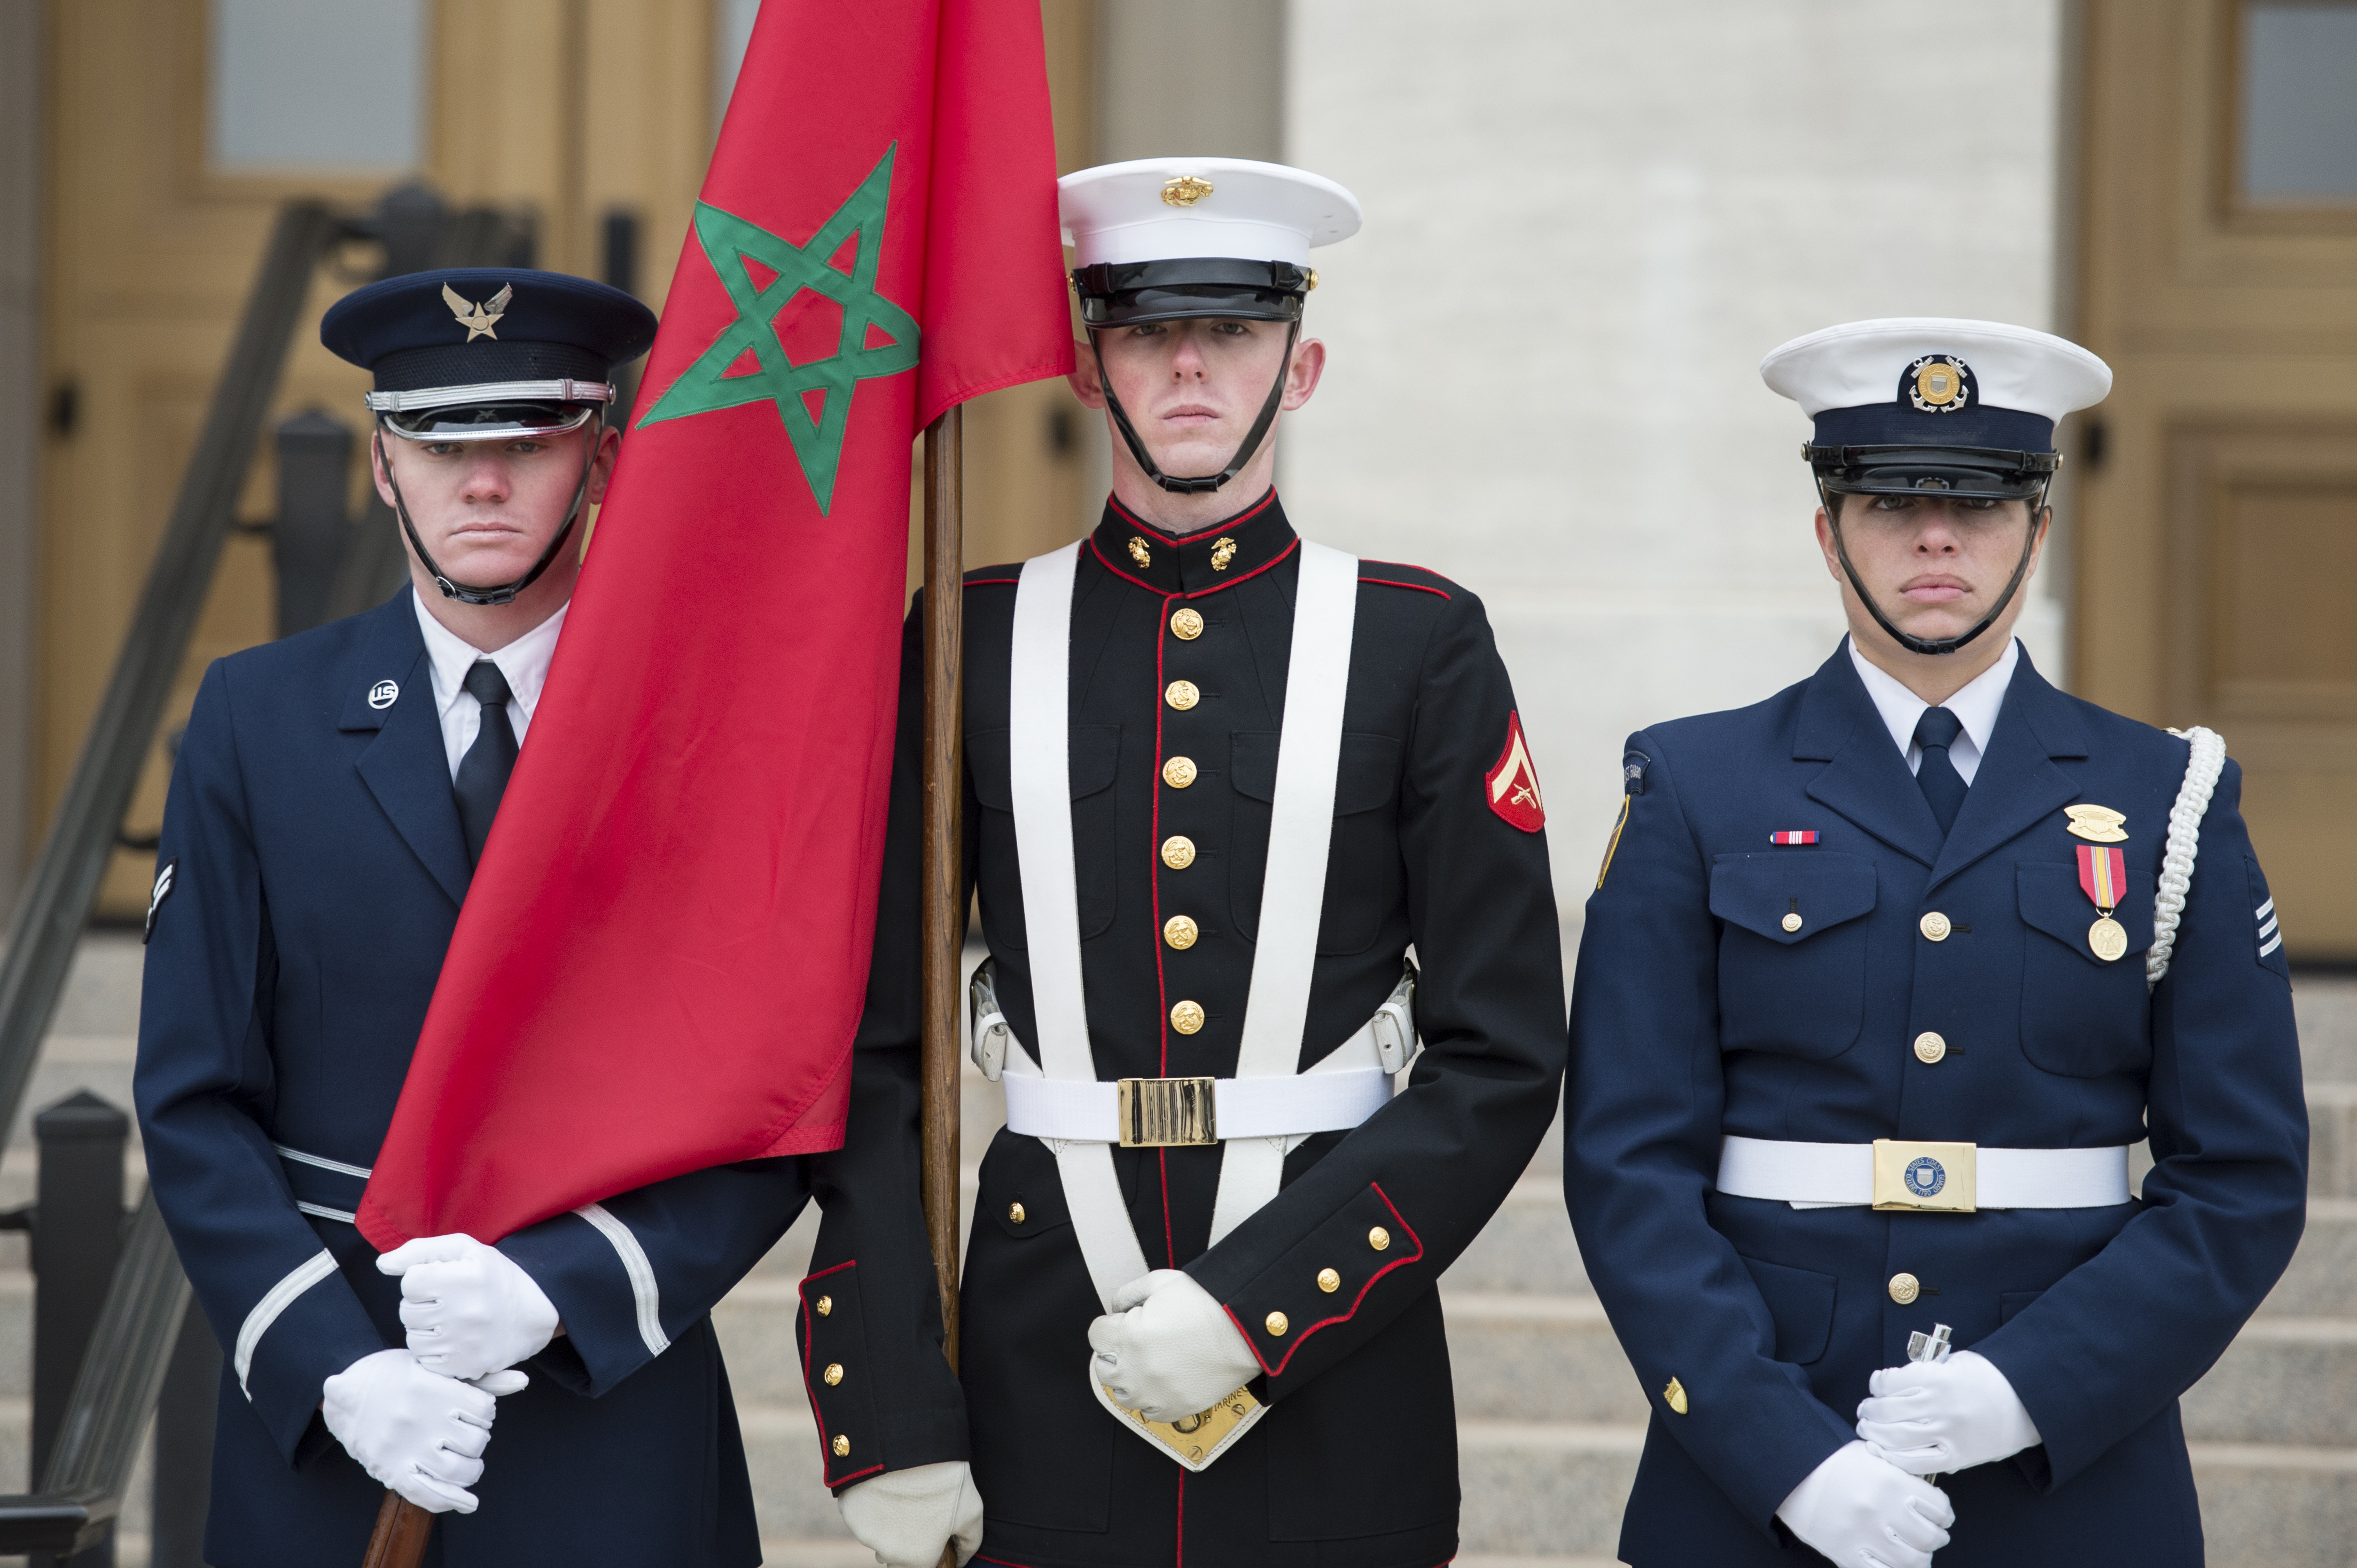 Cooperation militaire avec les USA - Page 3 15597559437_ca6ba4874d_o